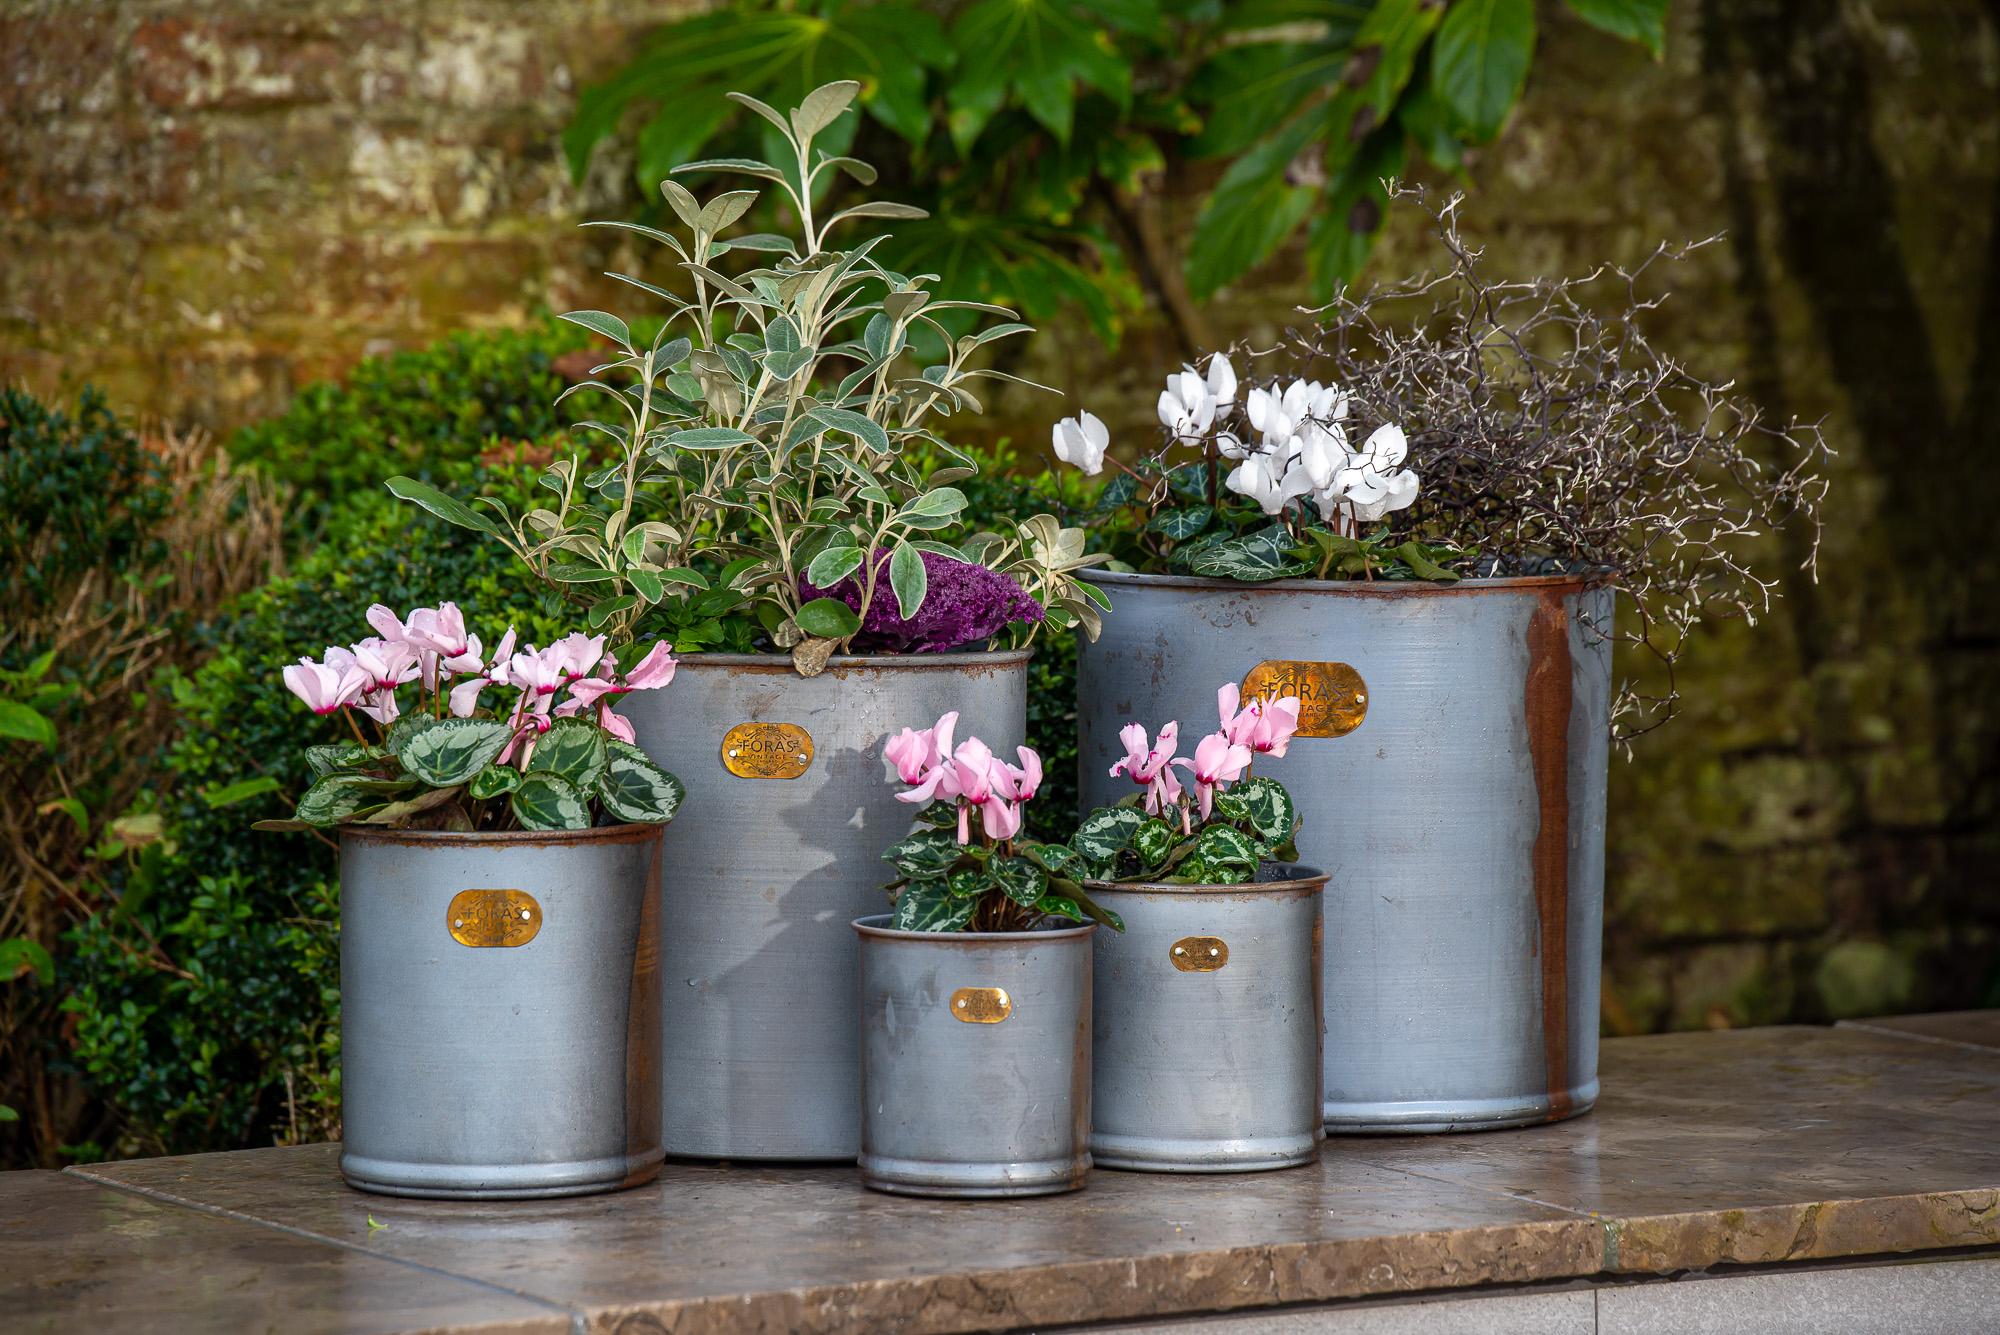 Hibiscus Planters